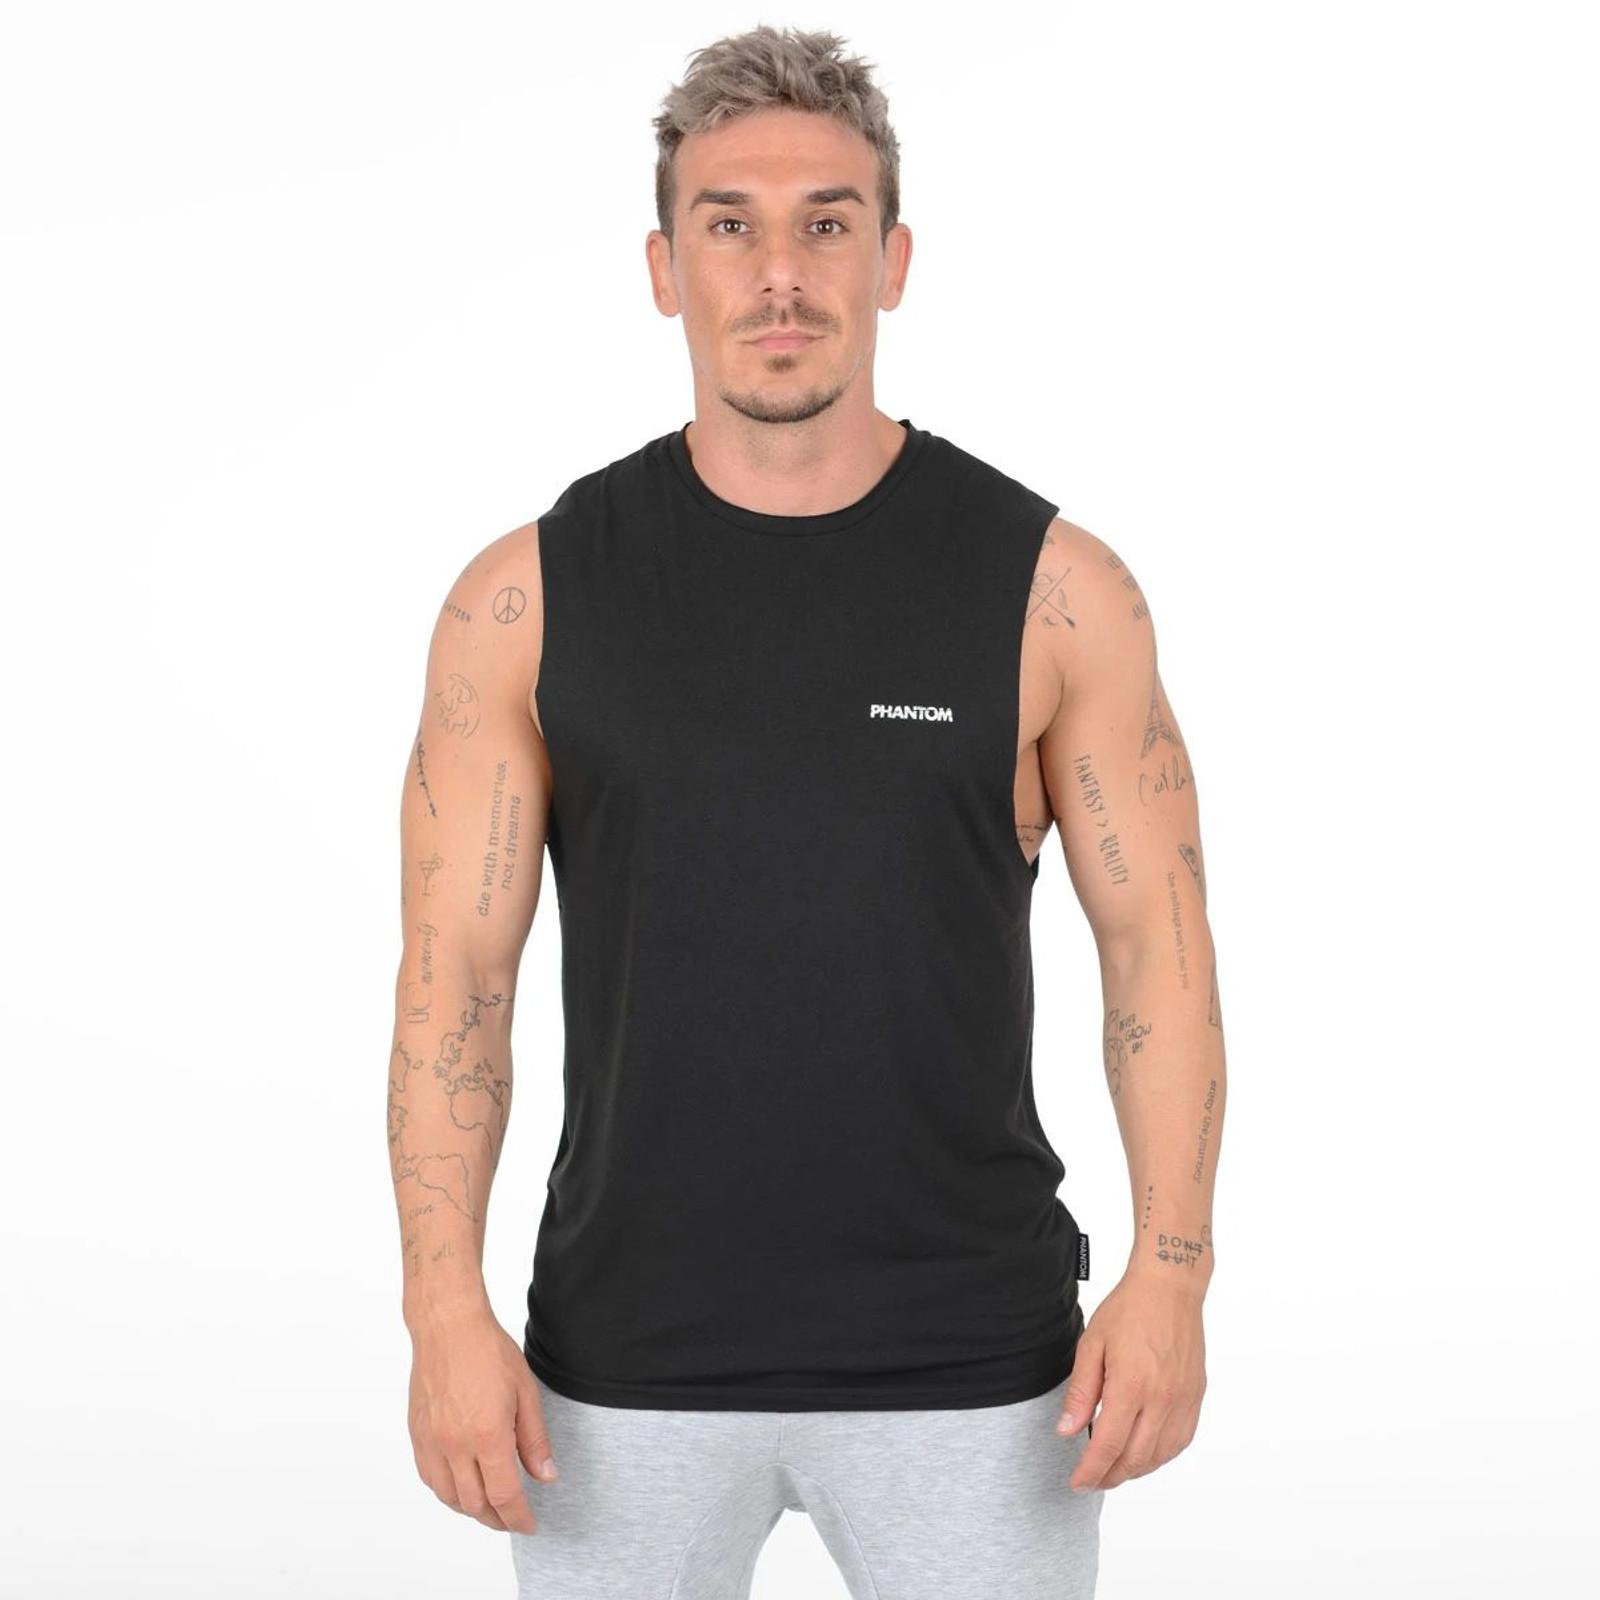 Phantom Athletics Herren Ärmelloses Shirt Superior